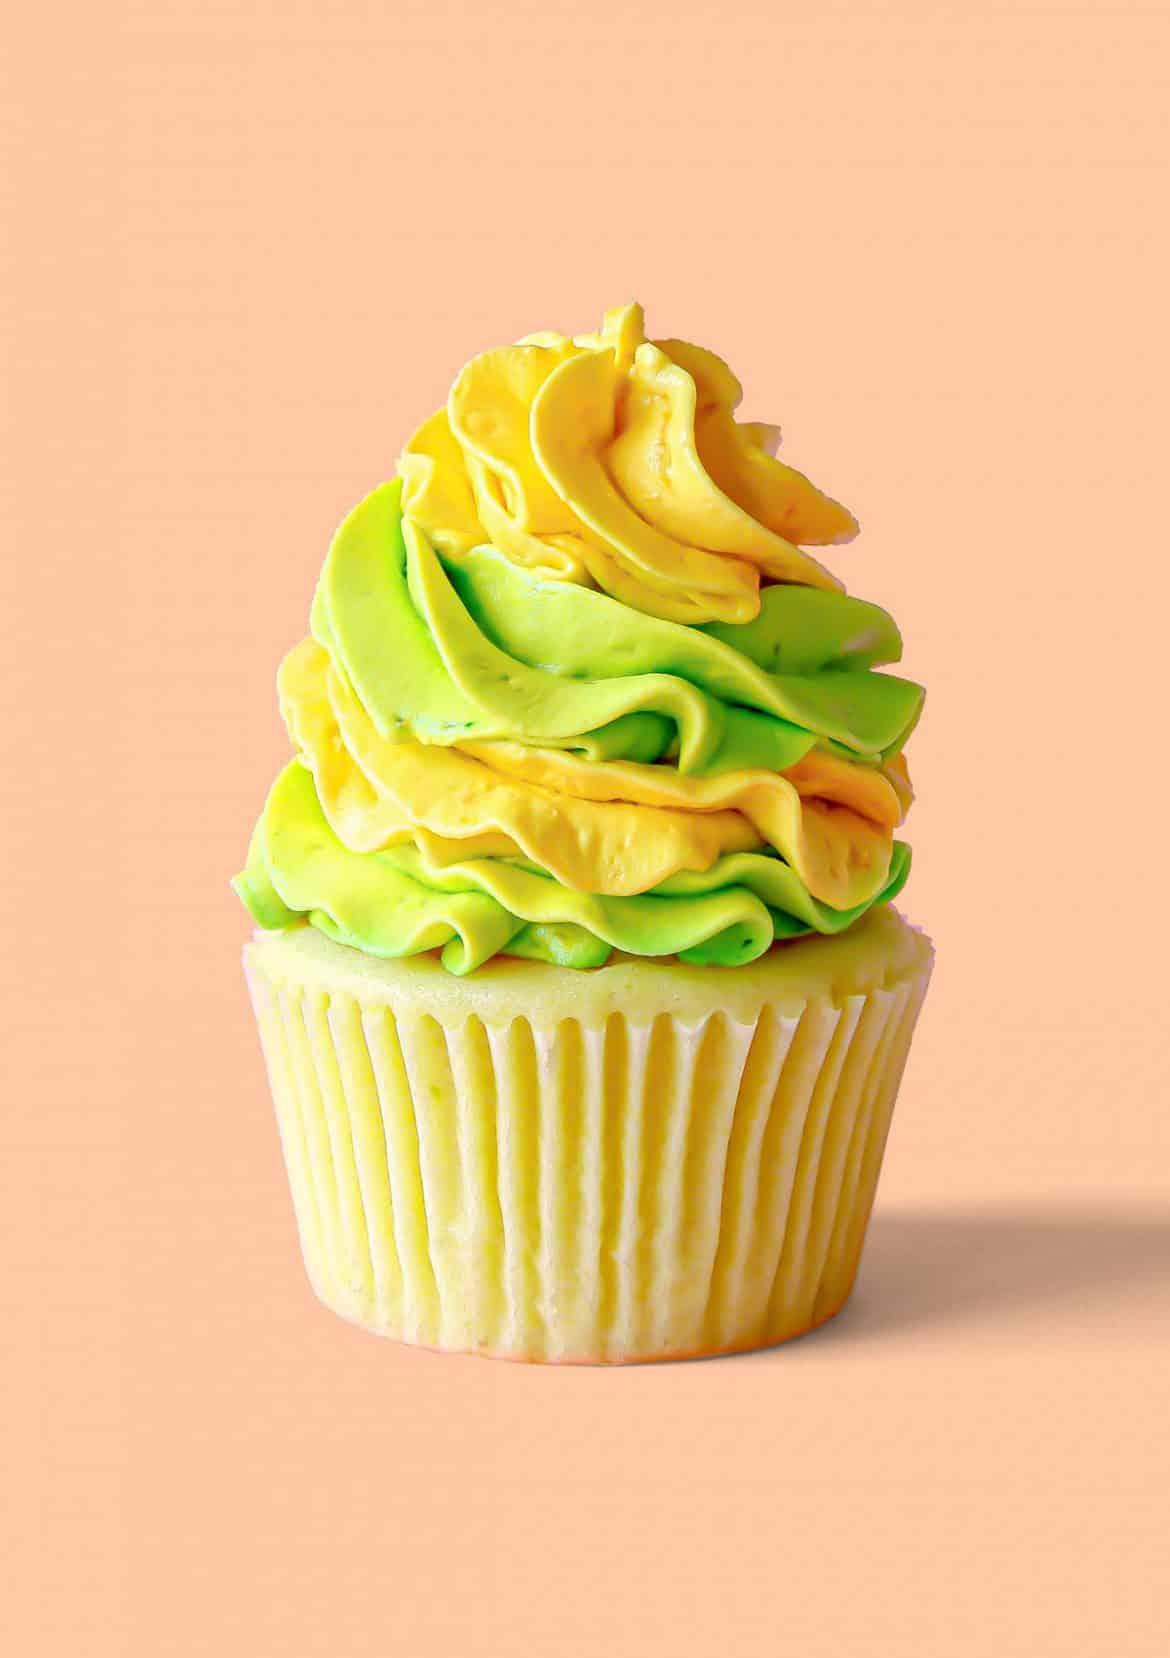 Lemon Lime Cheesecake Cupcakes